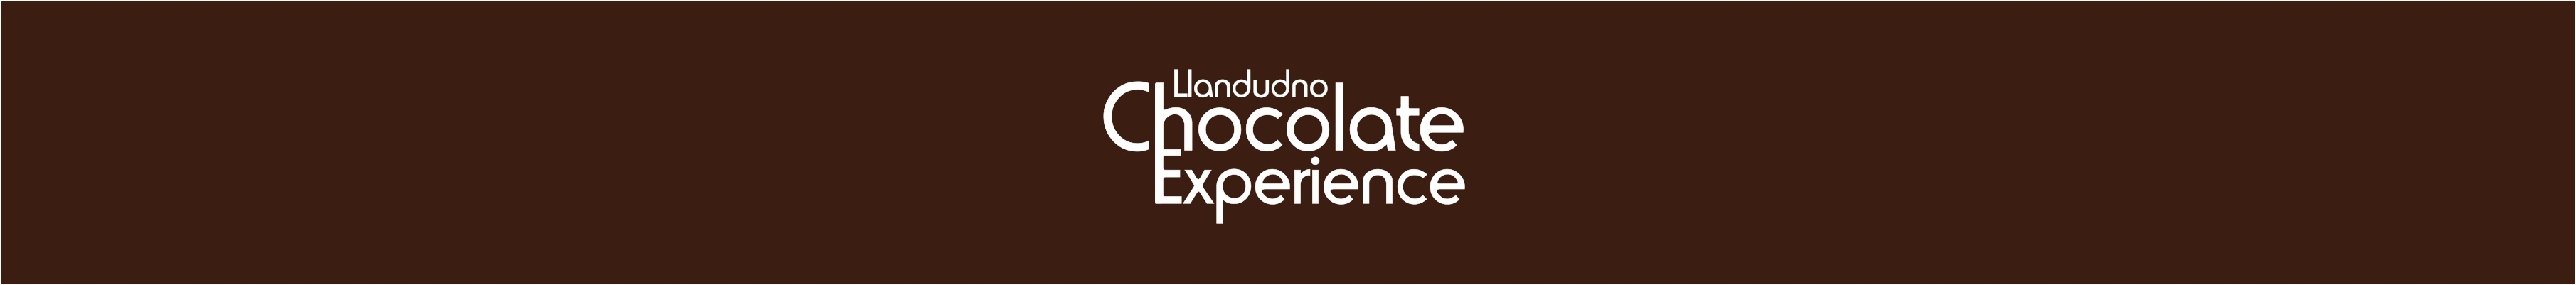 Llandudno Chocolate Experience Logo